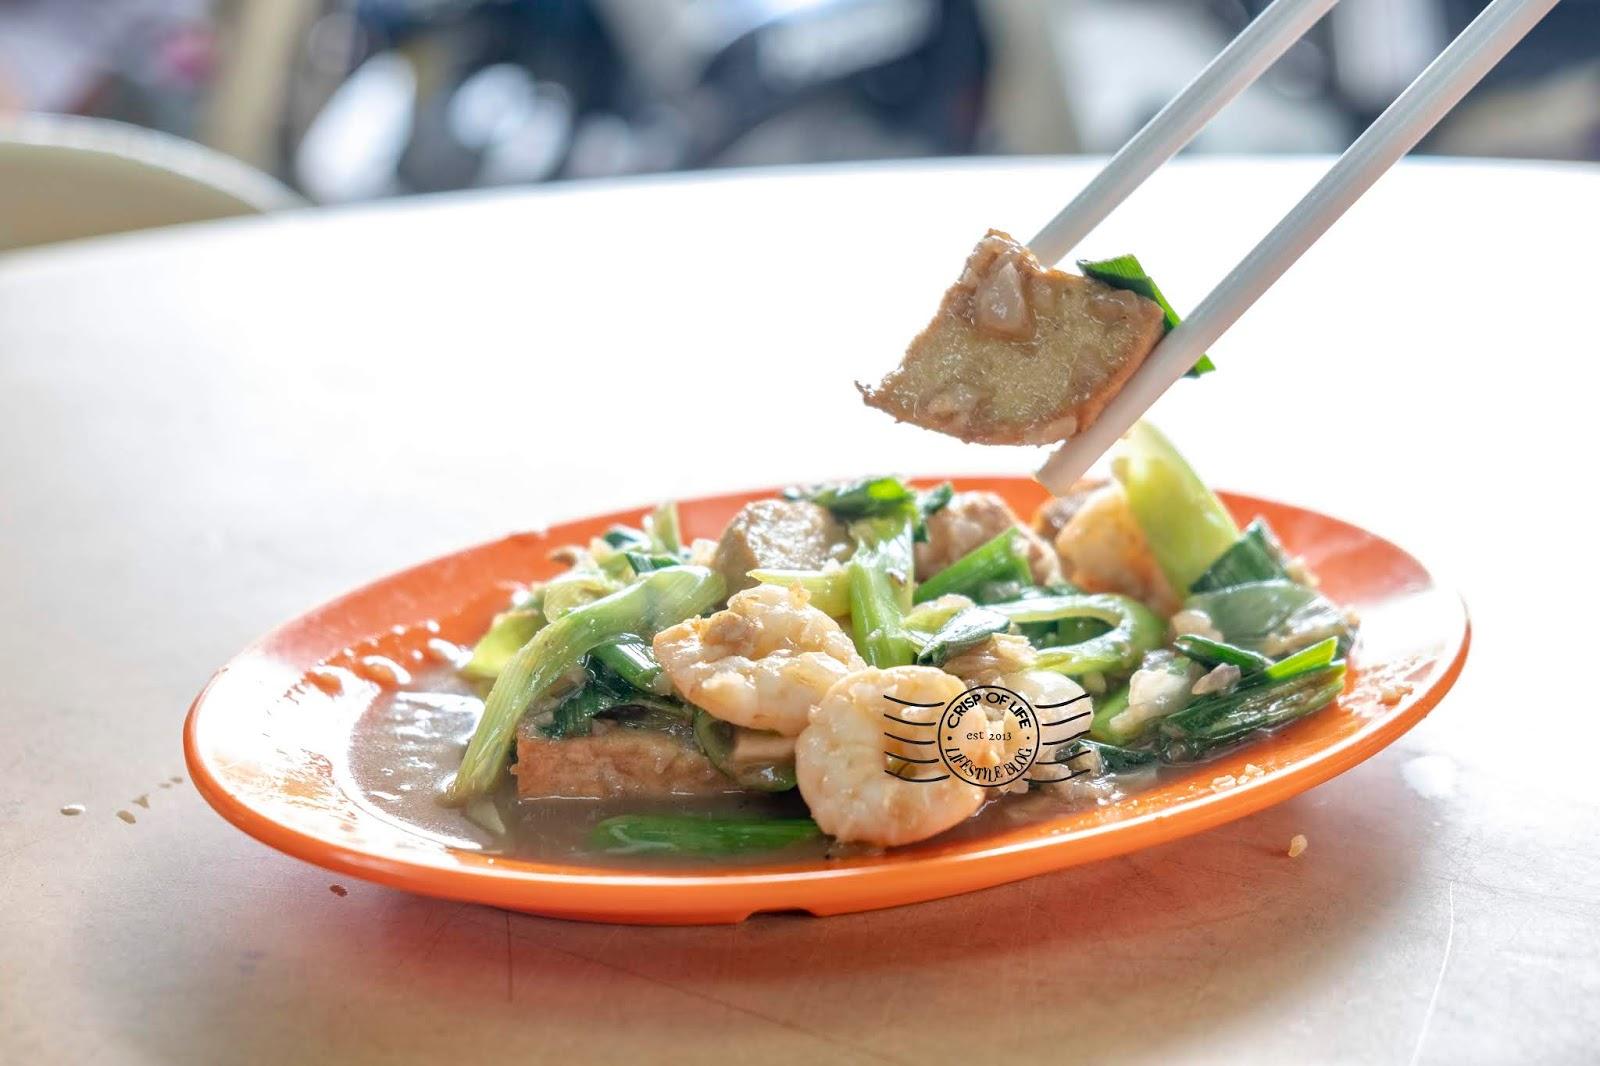 Authentic Hokkien Dishes @ Quan Zhou Cafe & Restaurant 泉洲小厨, Jalan Sungai Pinang, Penang